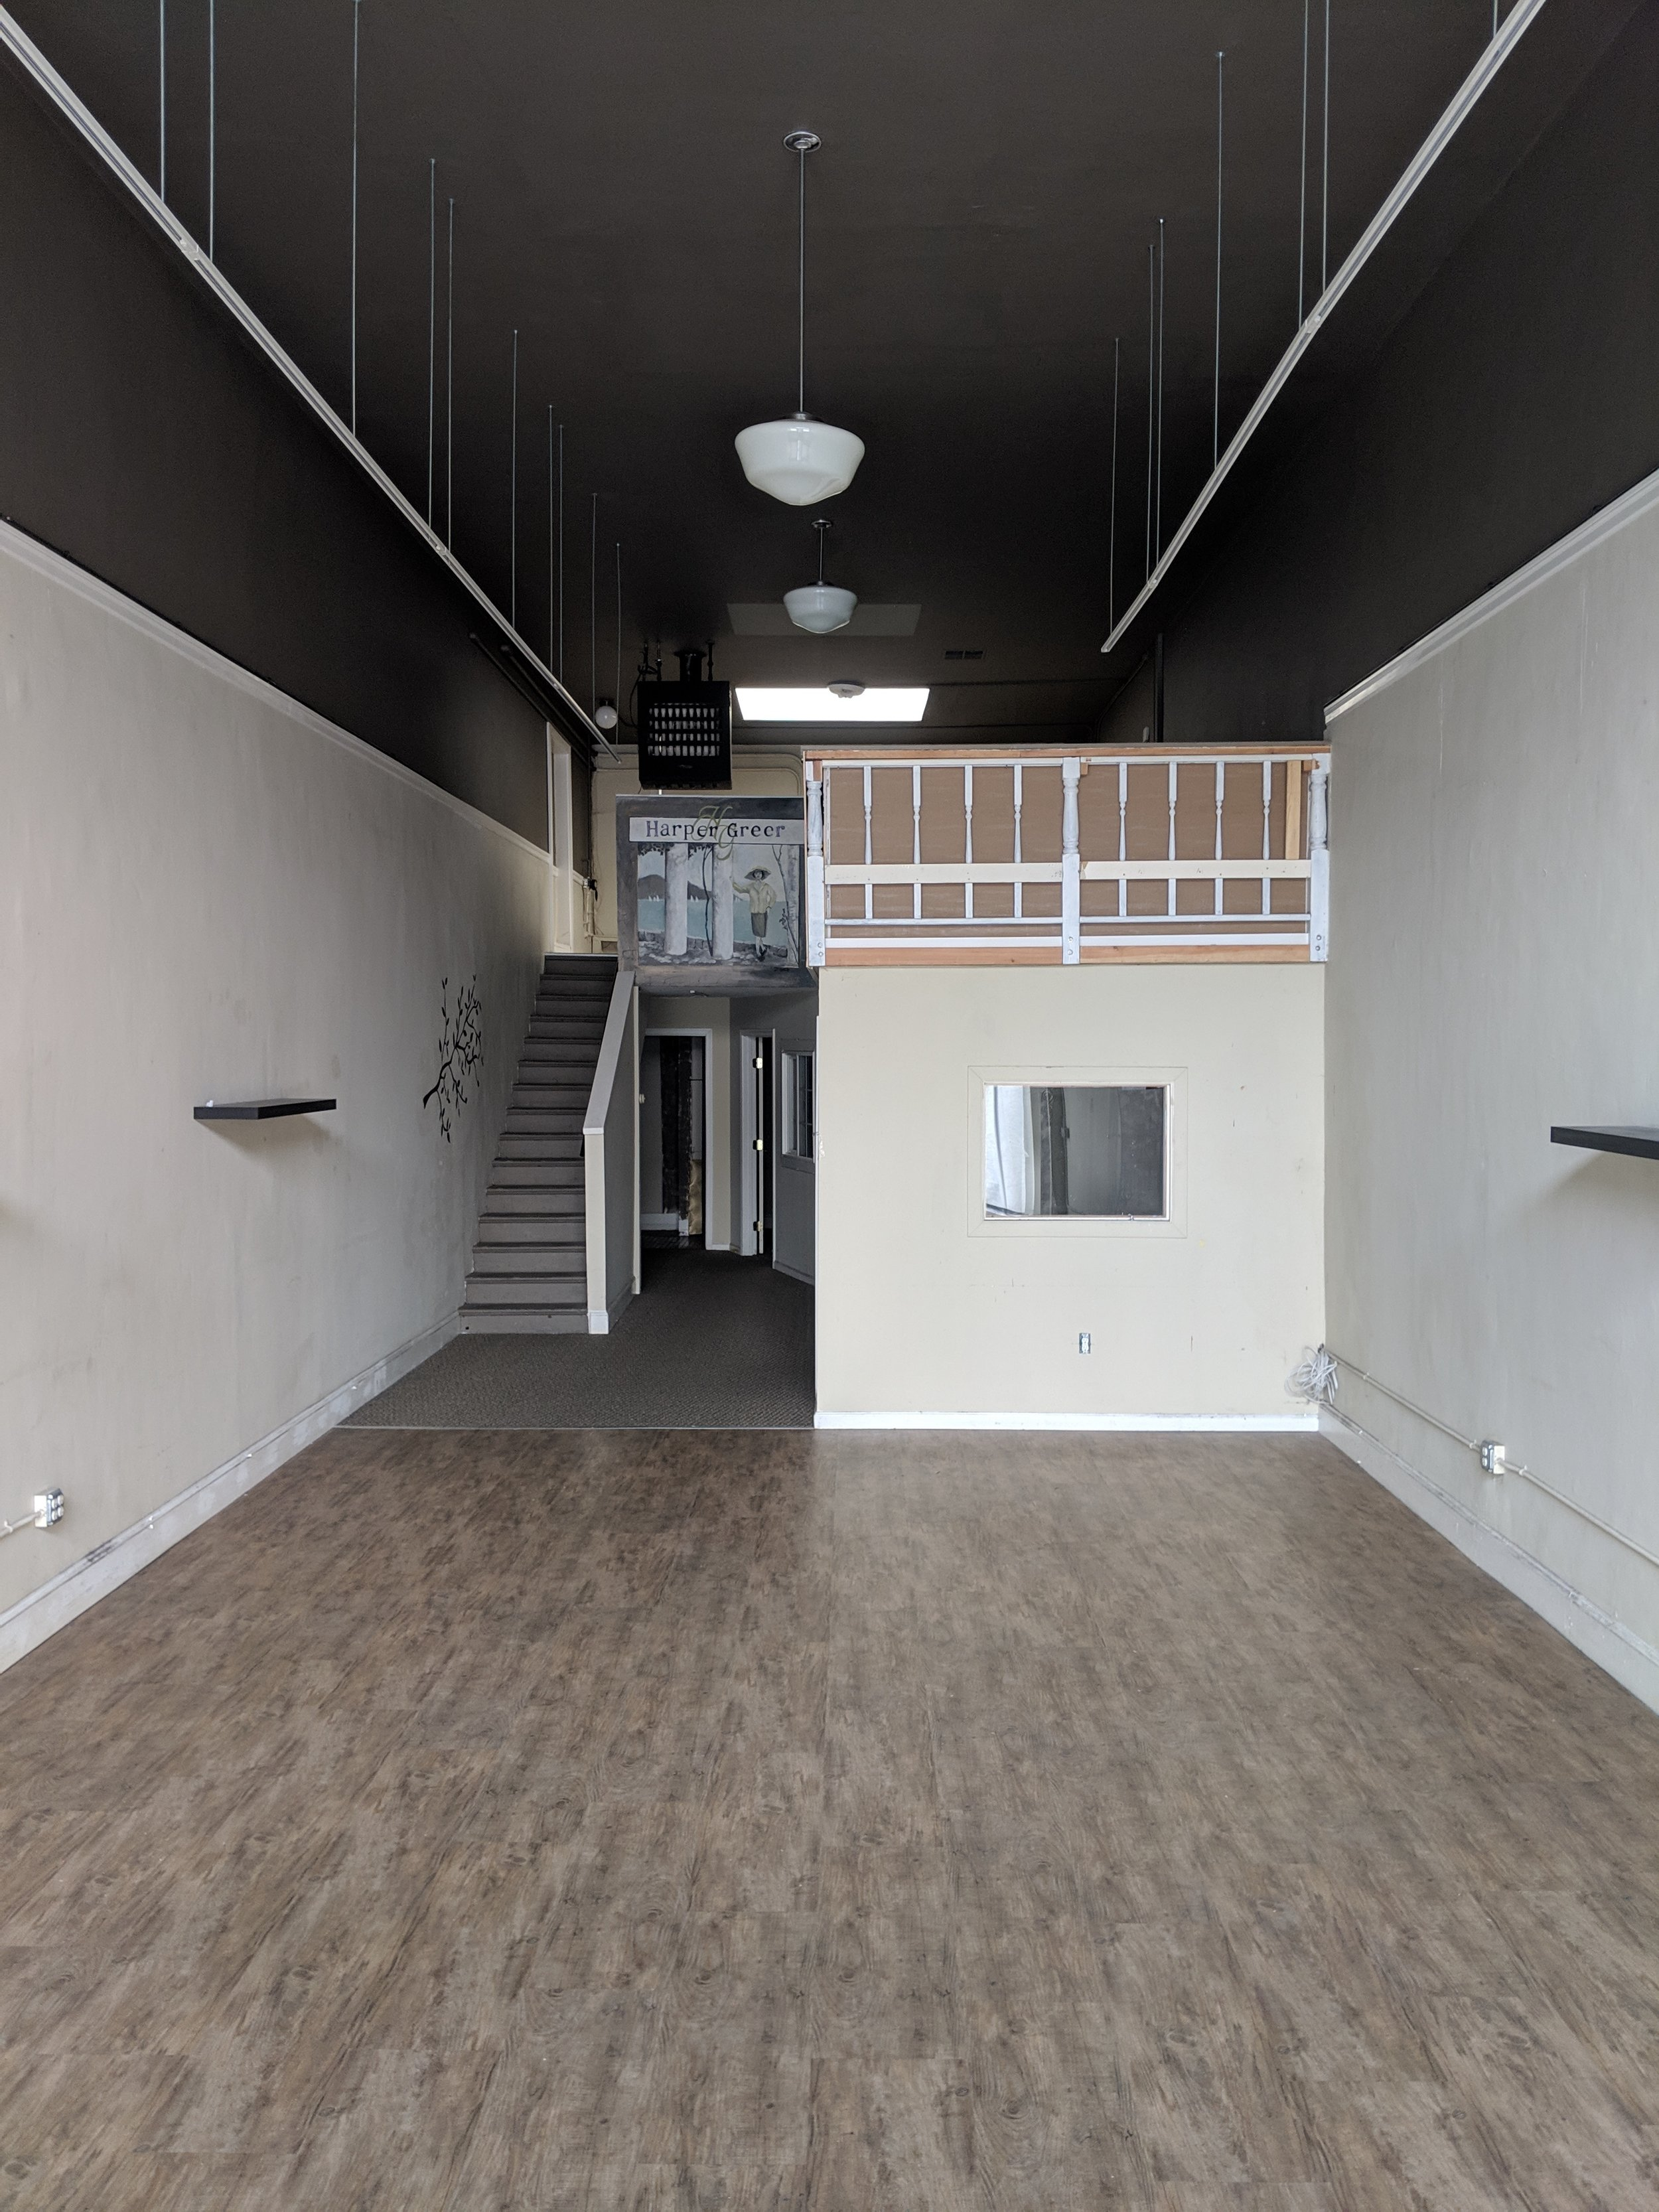 43 grand interior reg.jpg